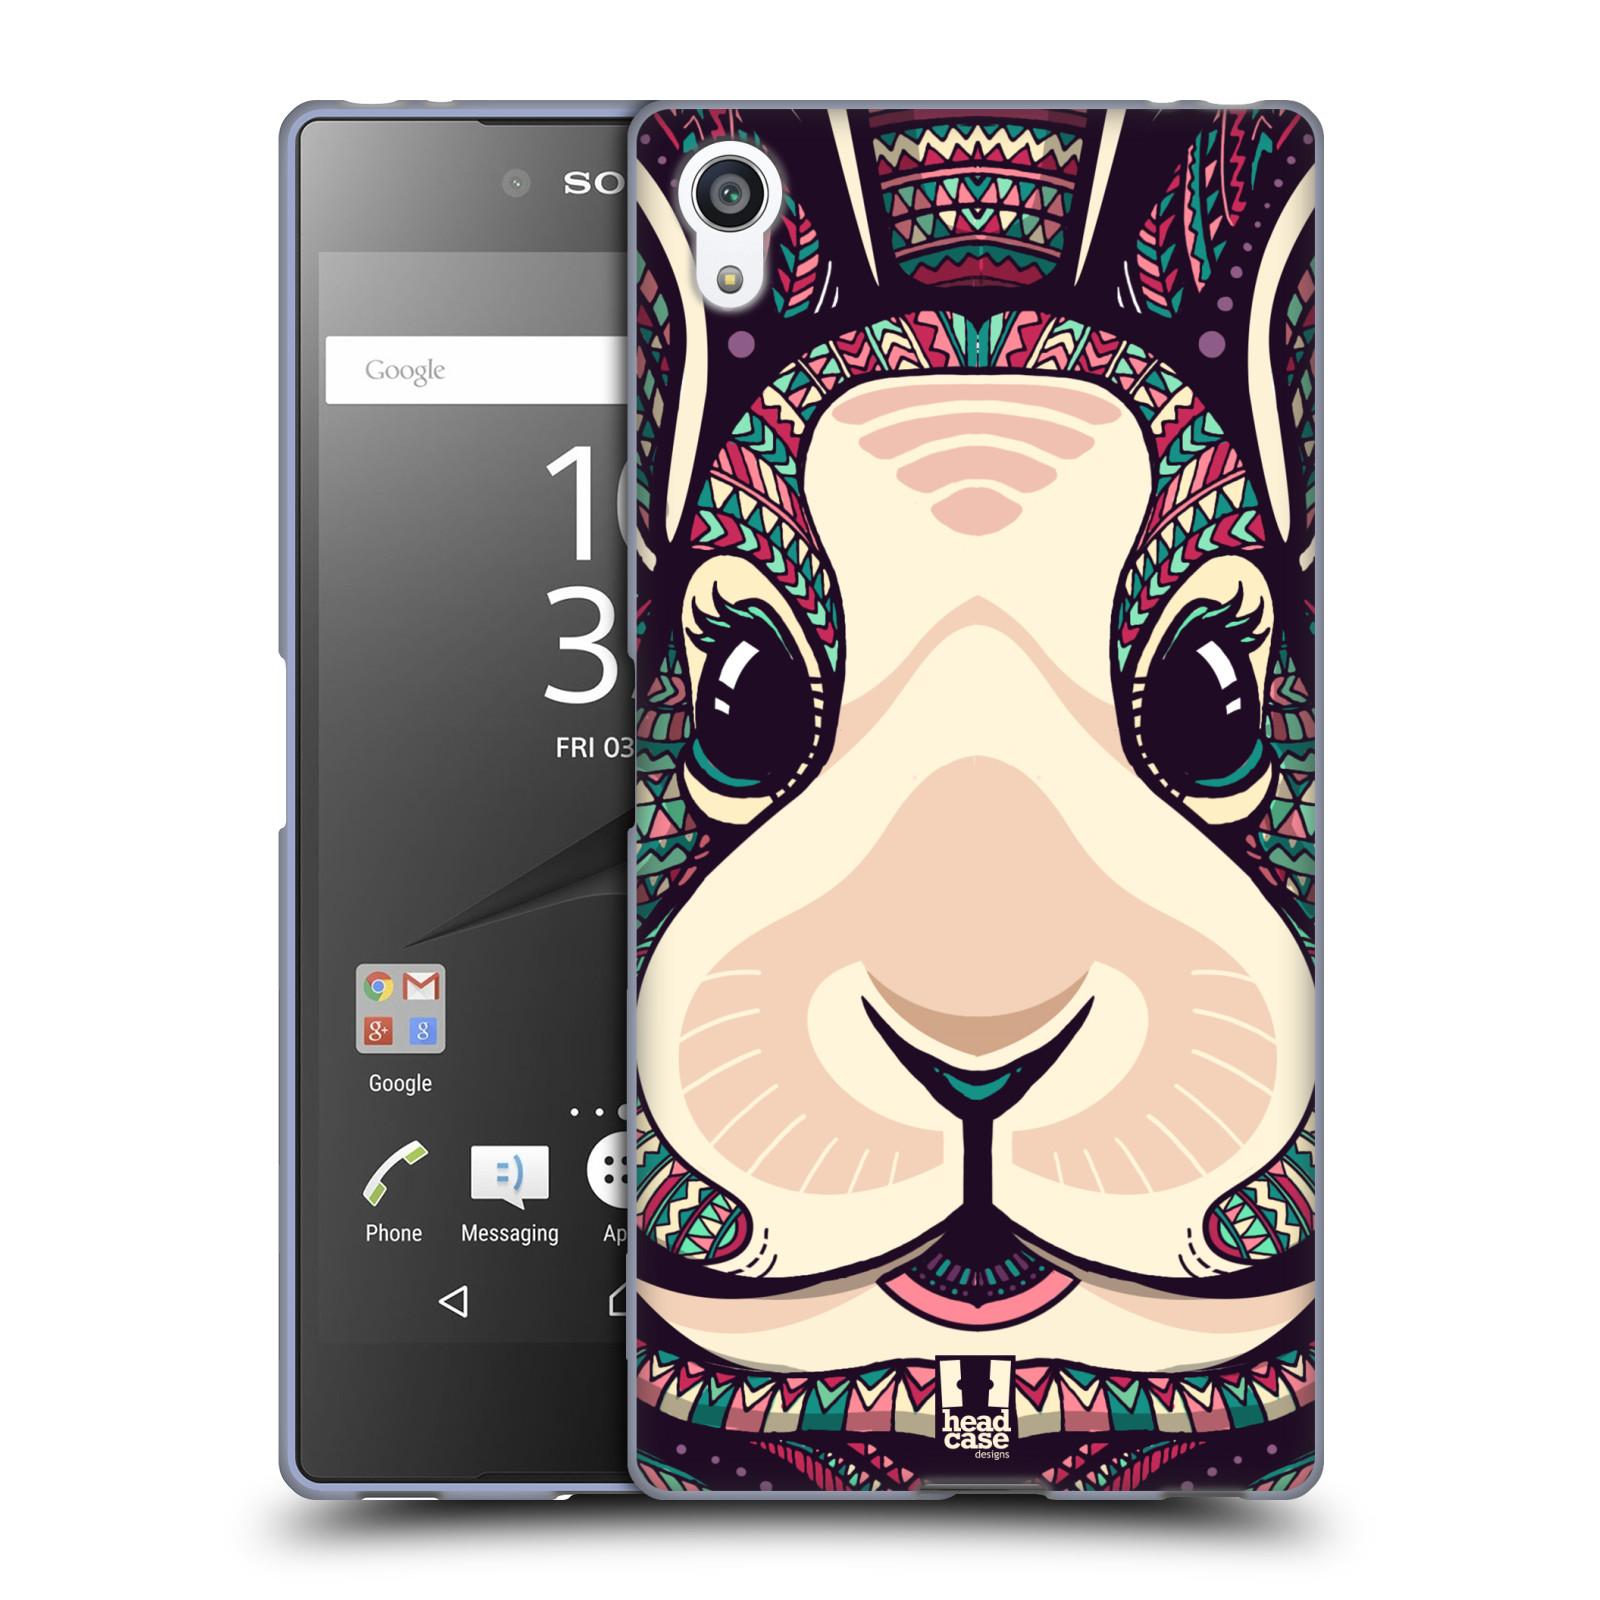 Silikonové pouzdro na mobil Sony Xperia Z5 Premium HEAD CASE AZTEC ZAJÍČEK